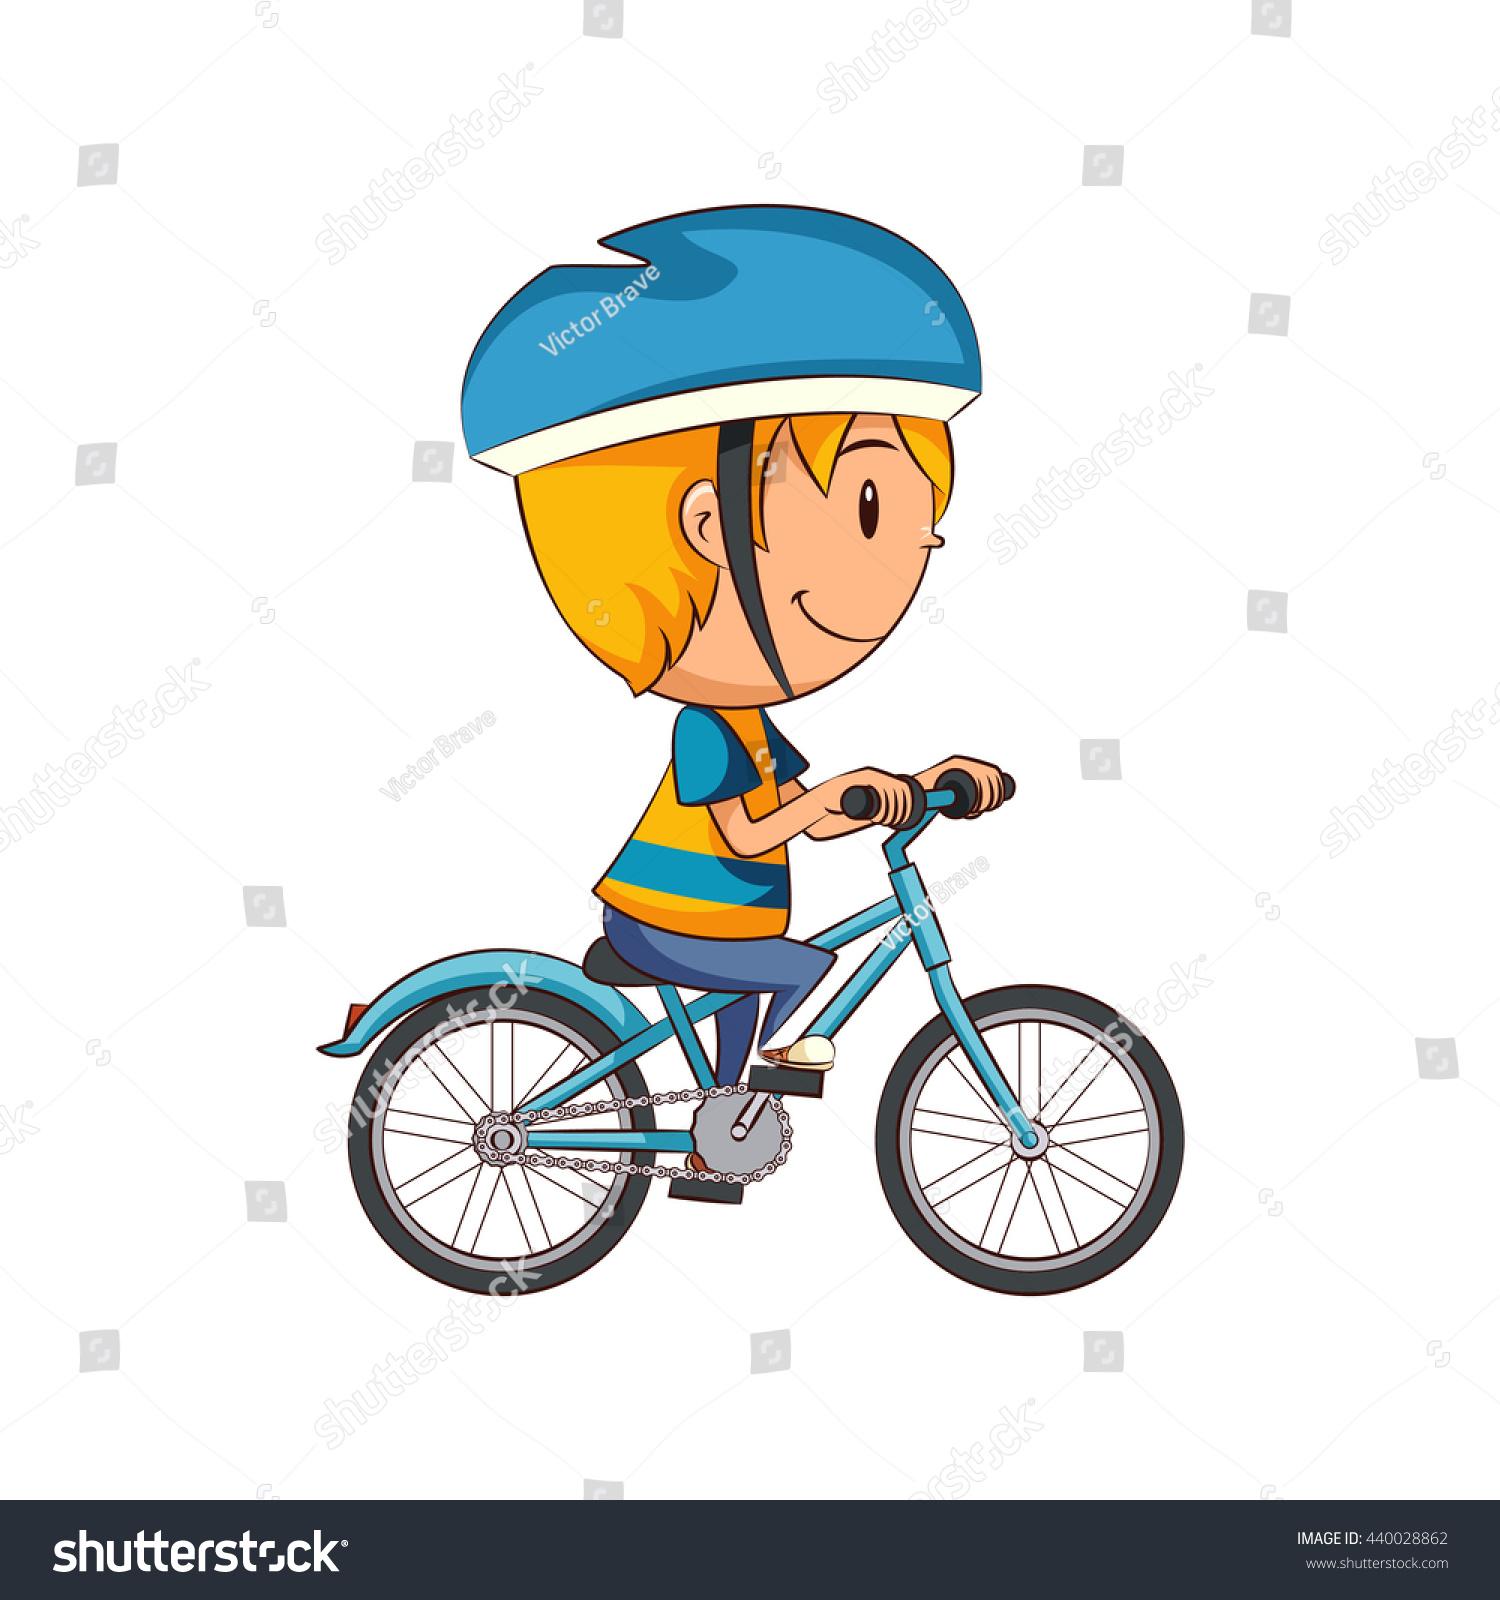 Similar Images Stock Photos Vectors Of Kid Riding Bike